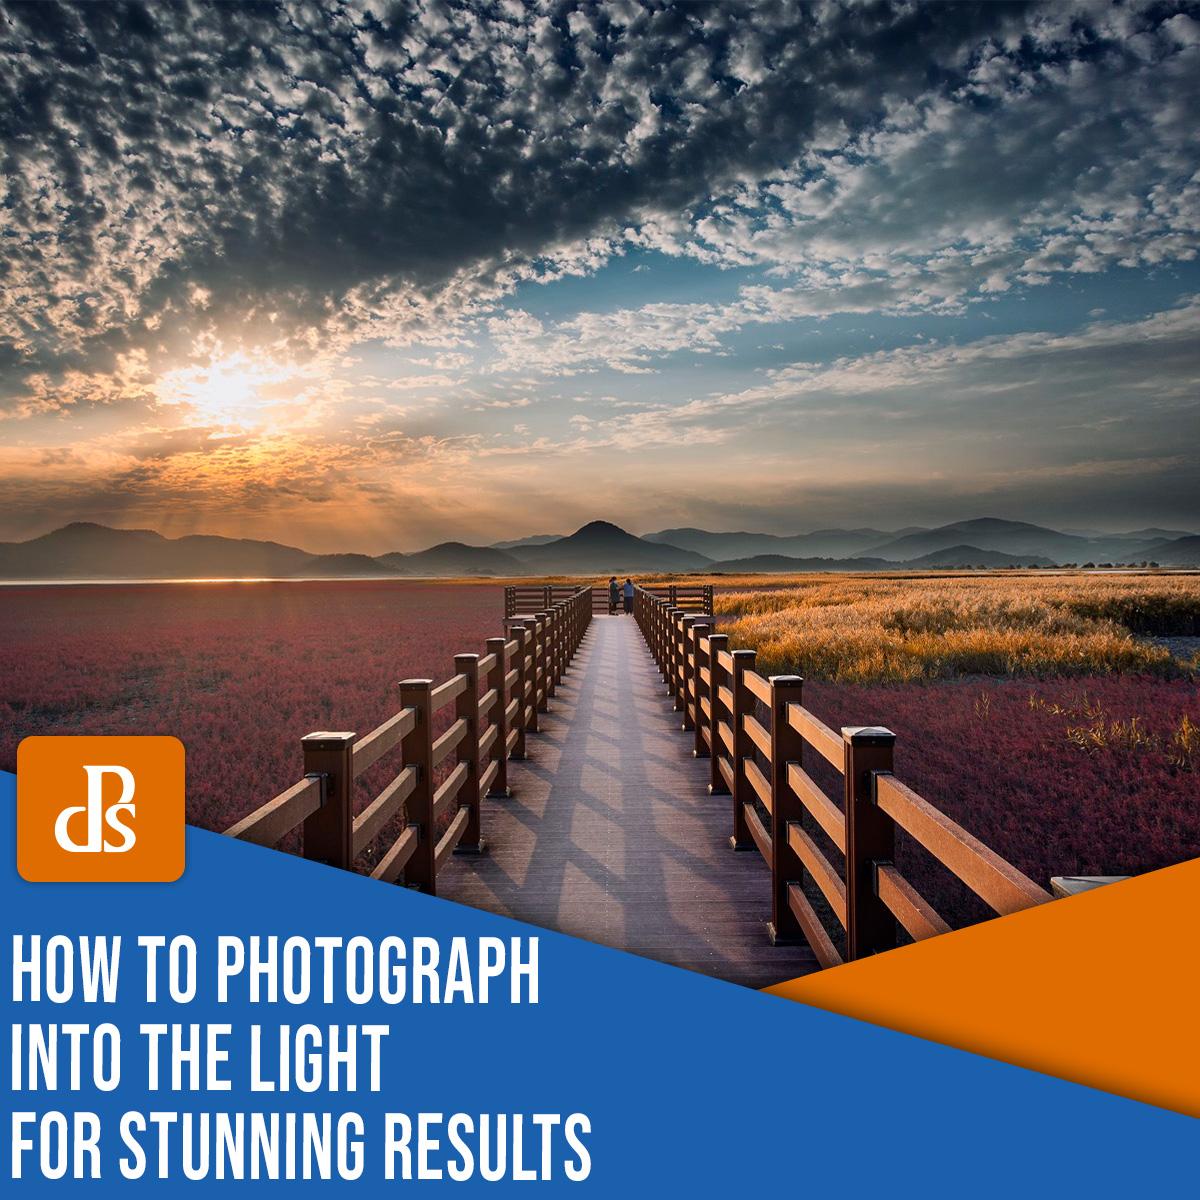 fotografando na luz